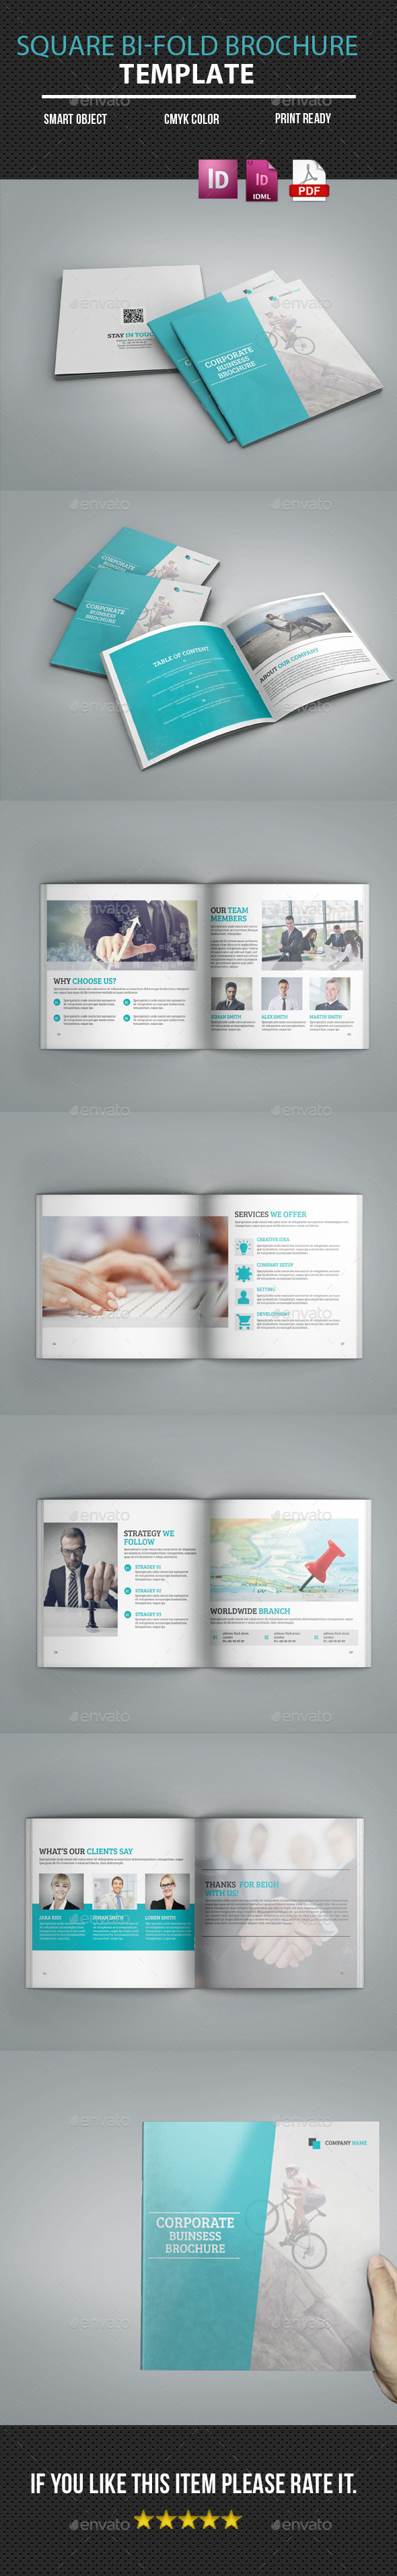 Square Bi-Fold Business Brochure - Corporate Brochures